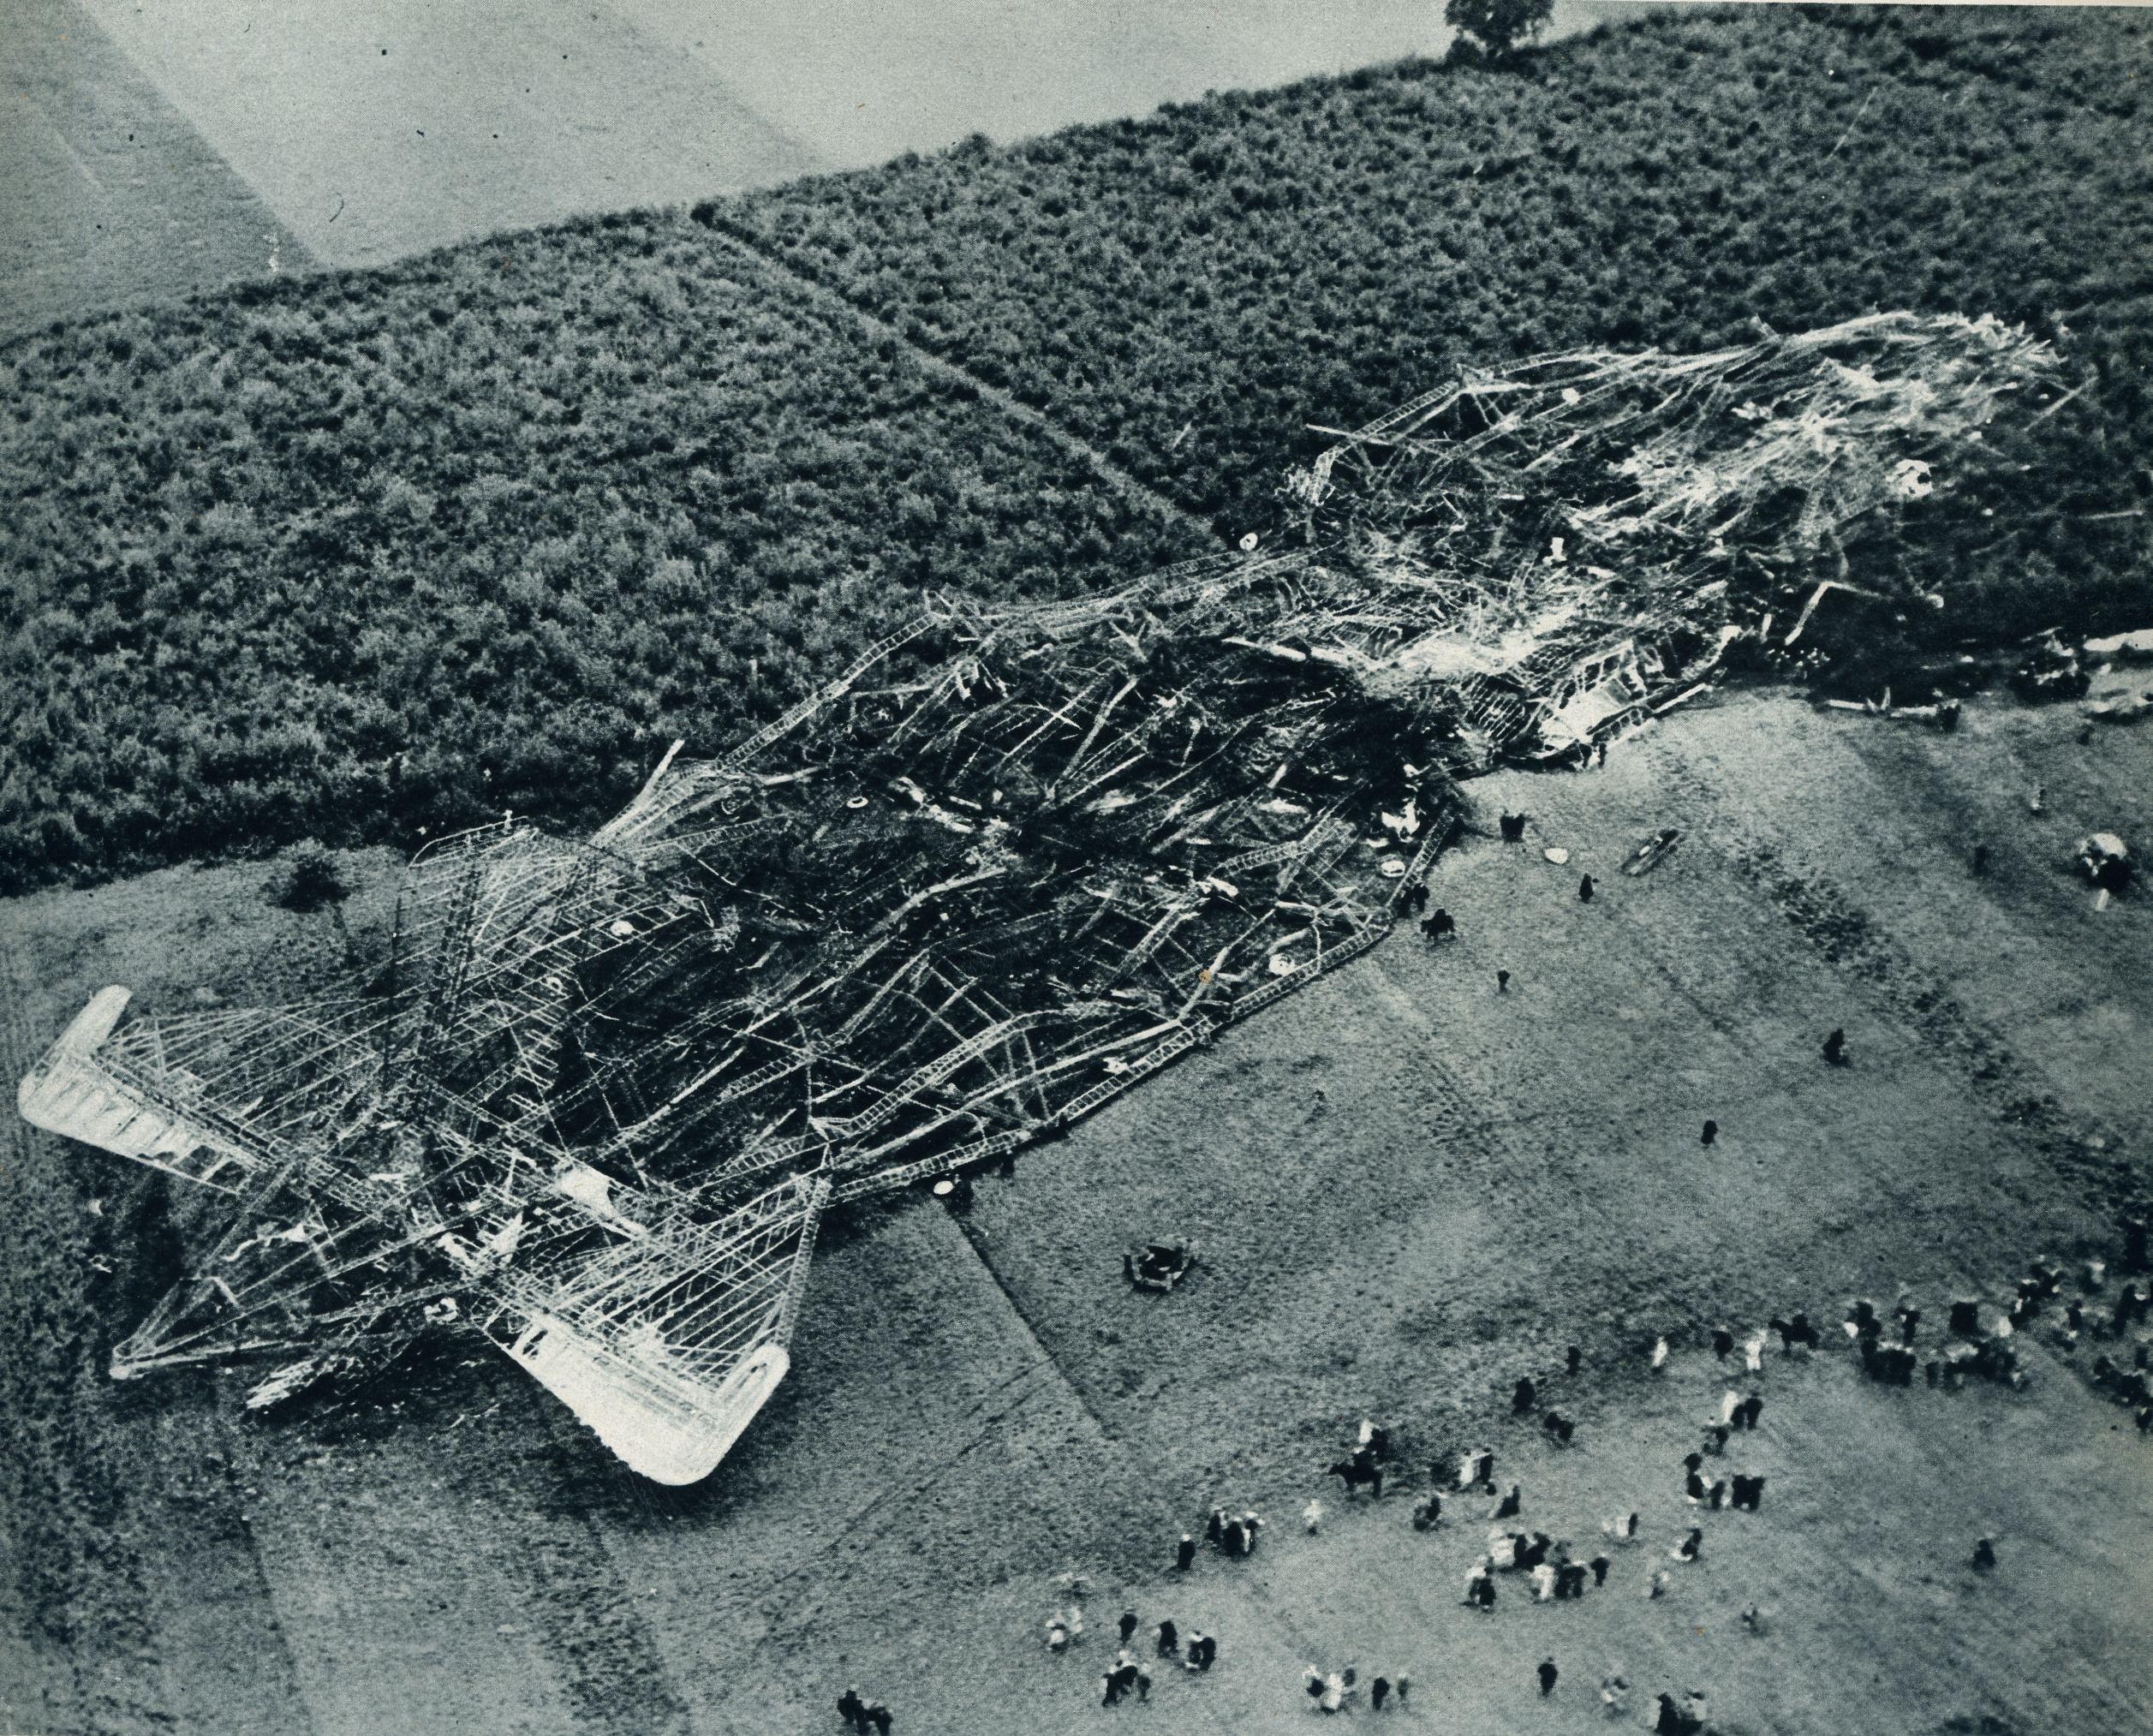 R101 Airship crash | Airship balloon, Airship, Zeppelin airship